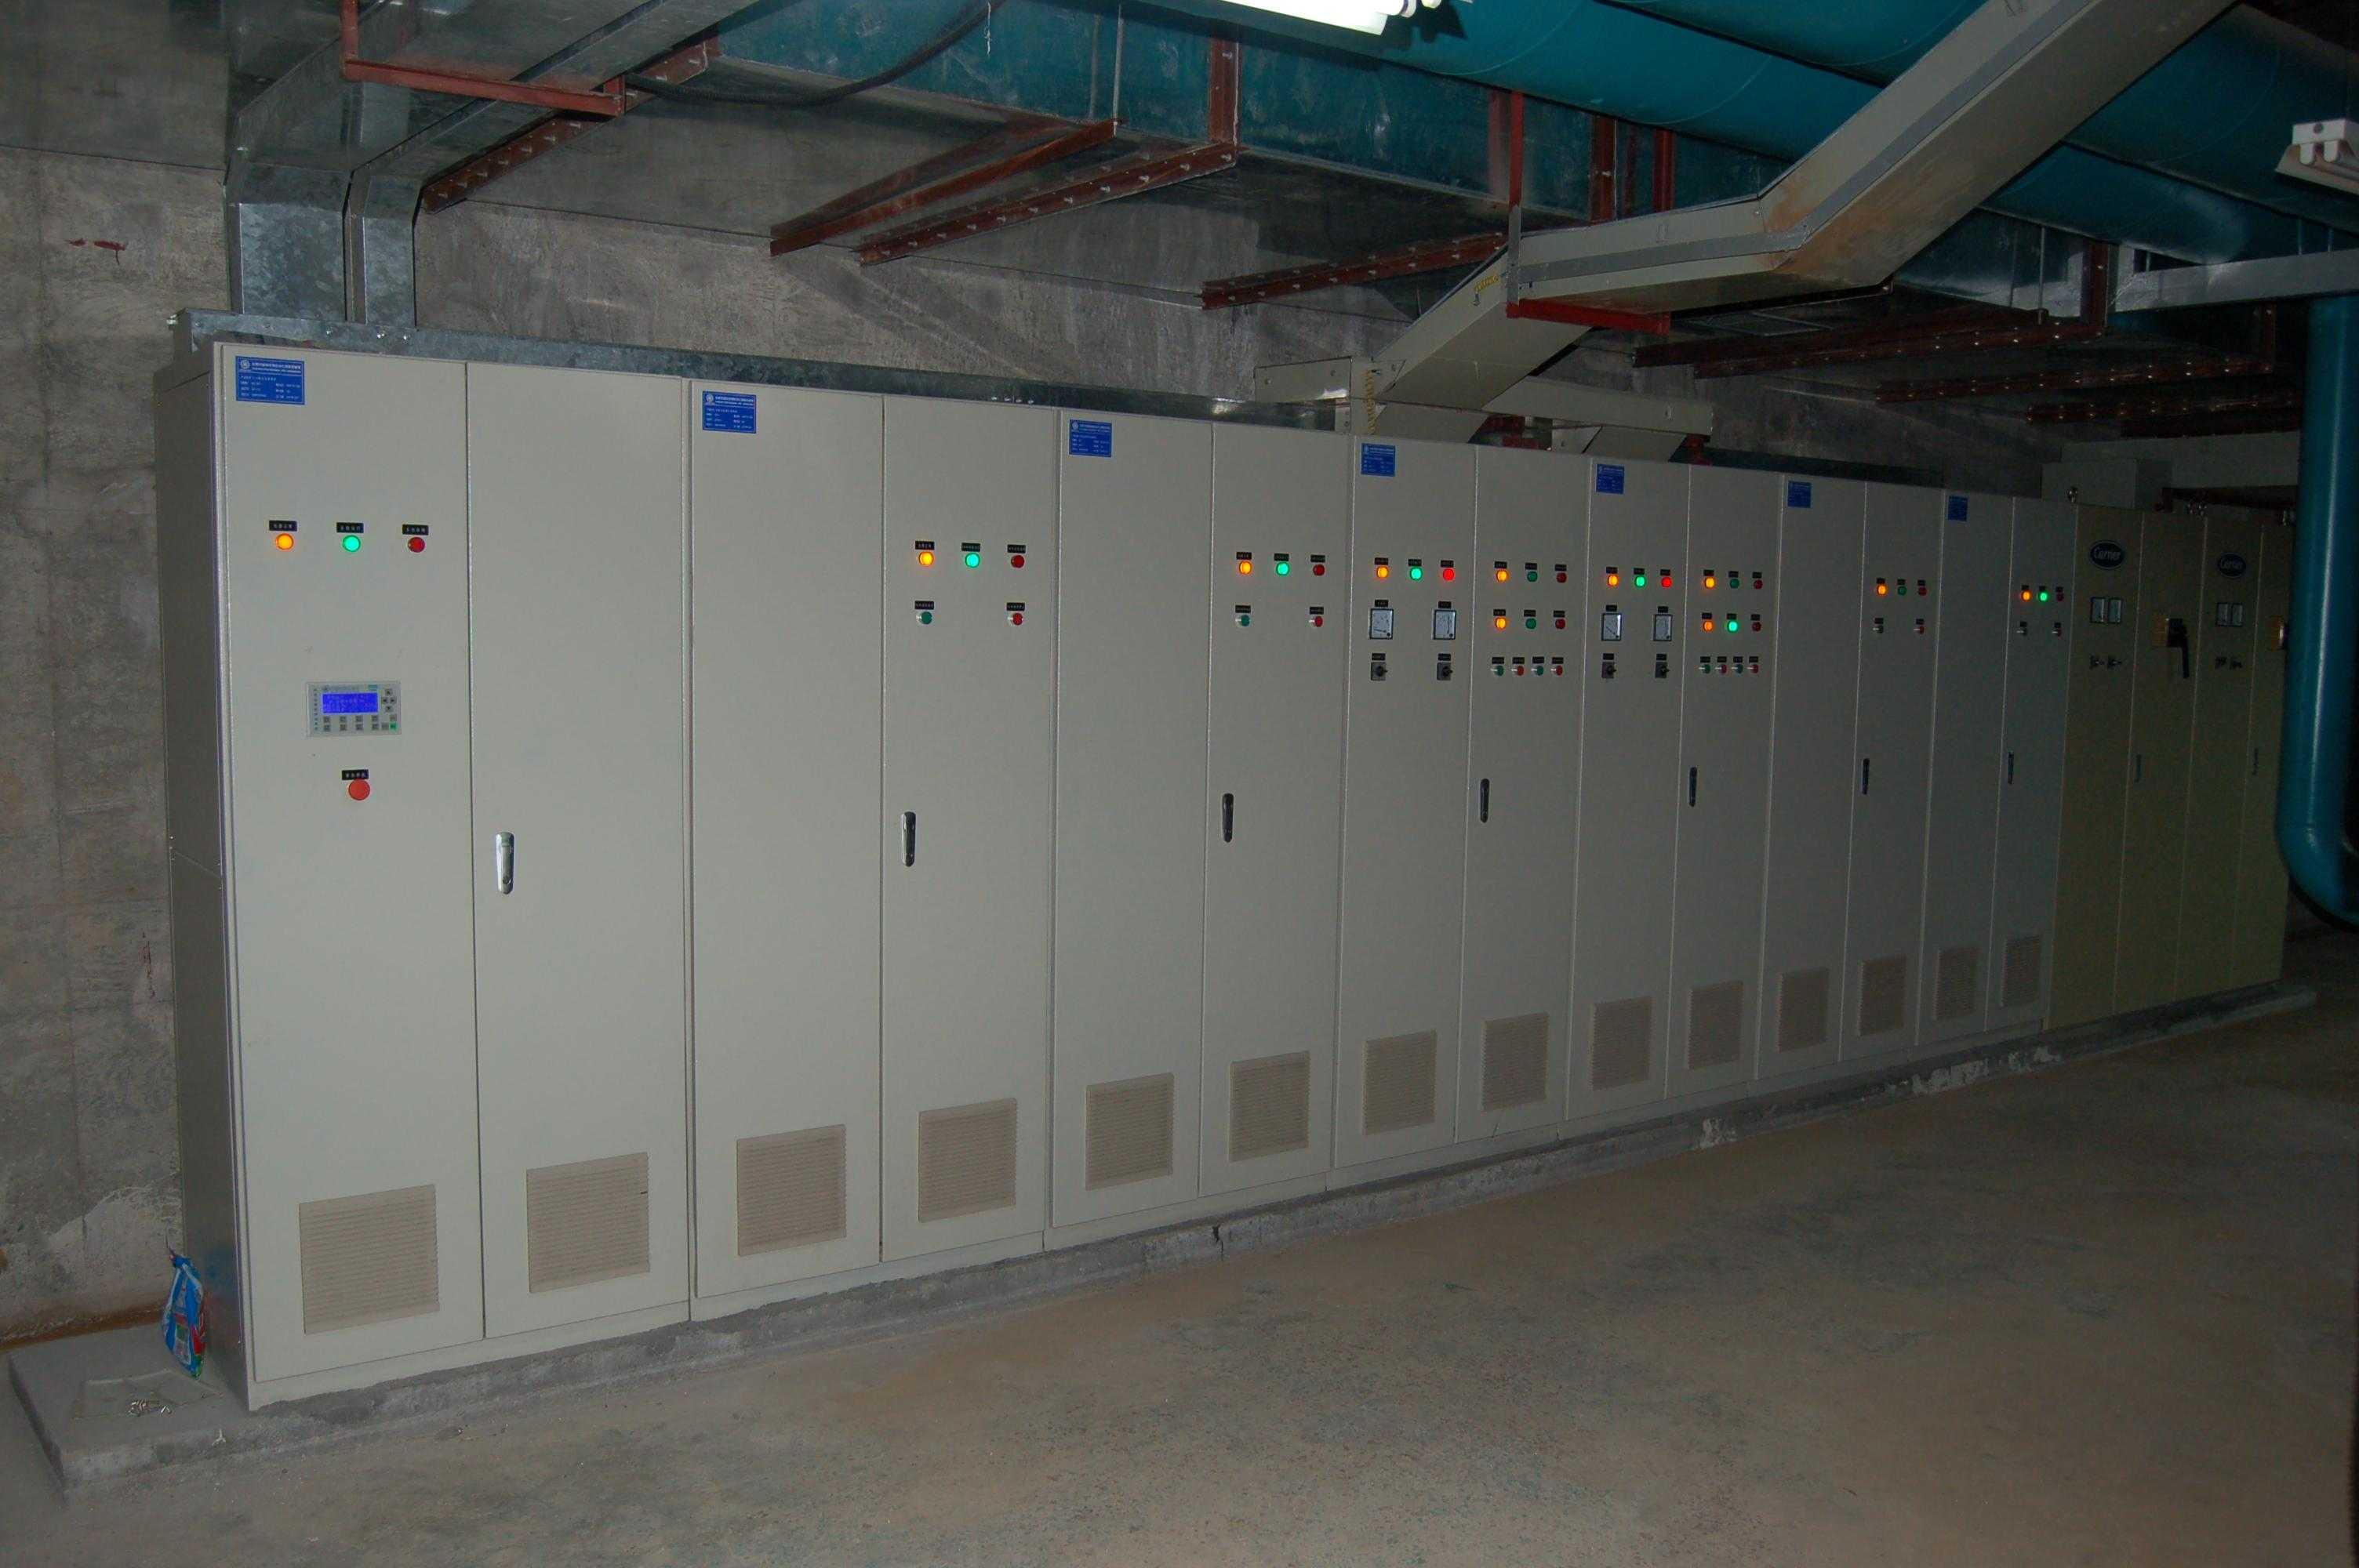 ddc自动化控制电箱 - 东莞市东城信裕空调自动化设备